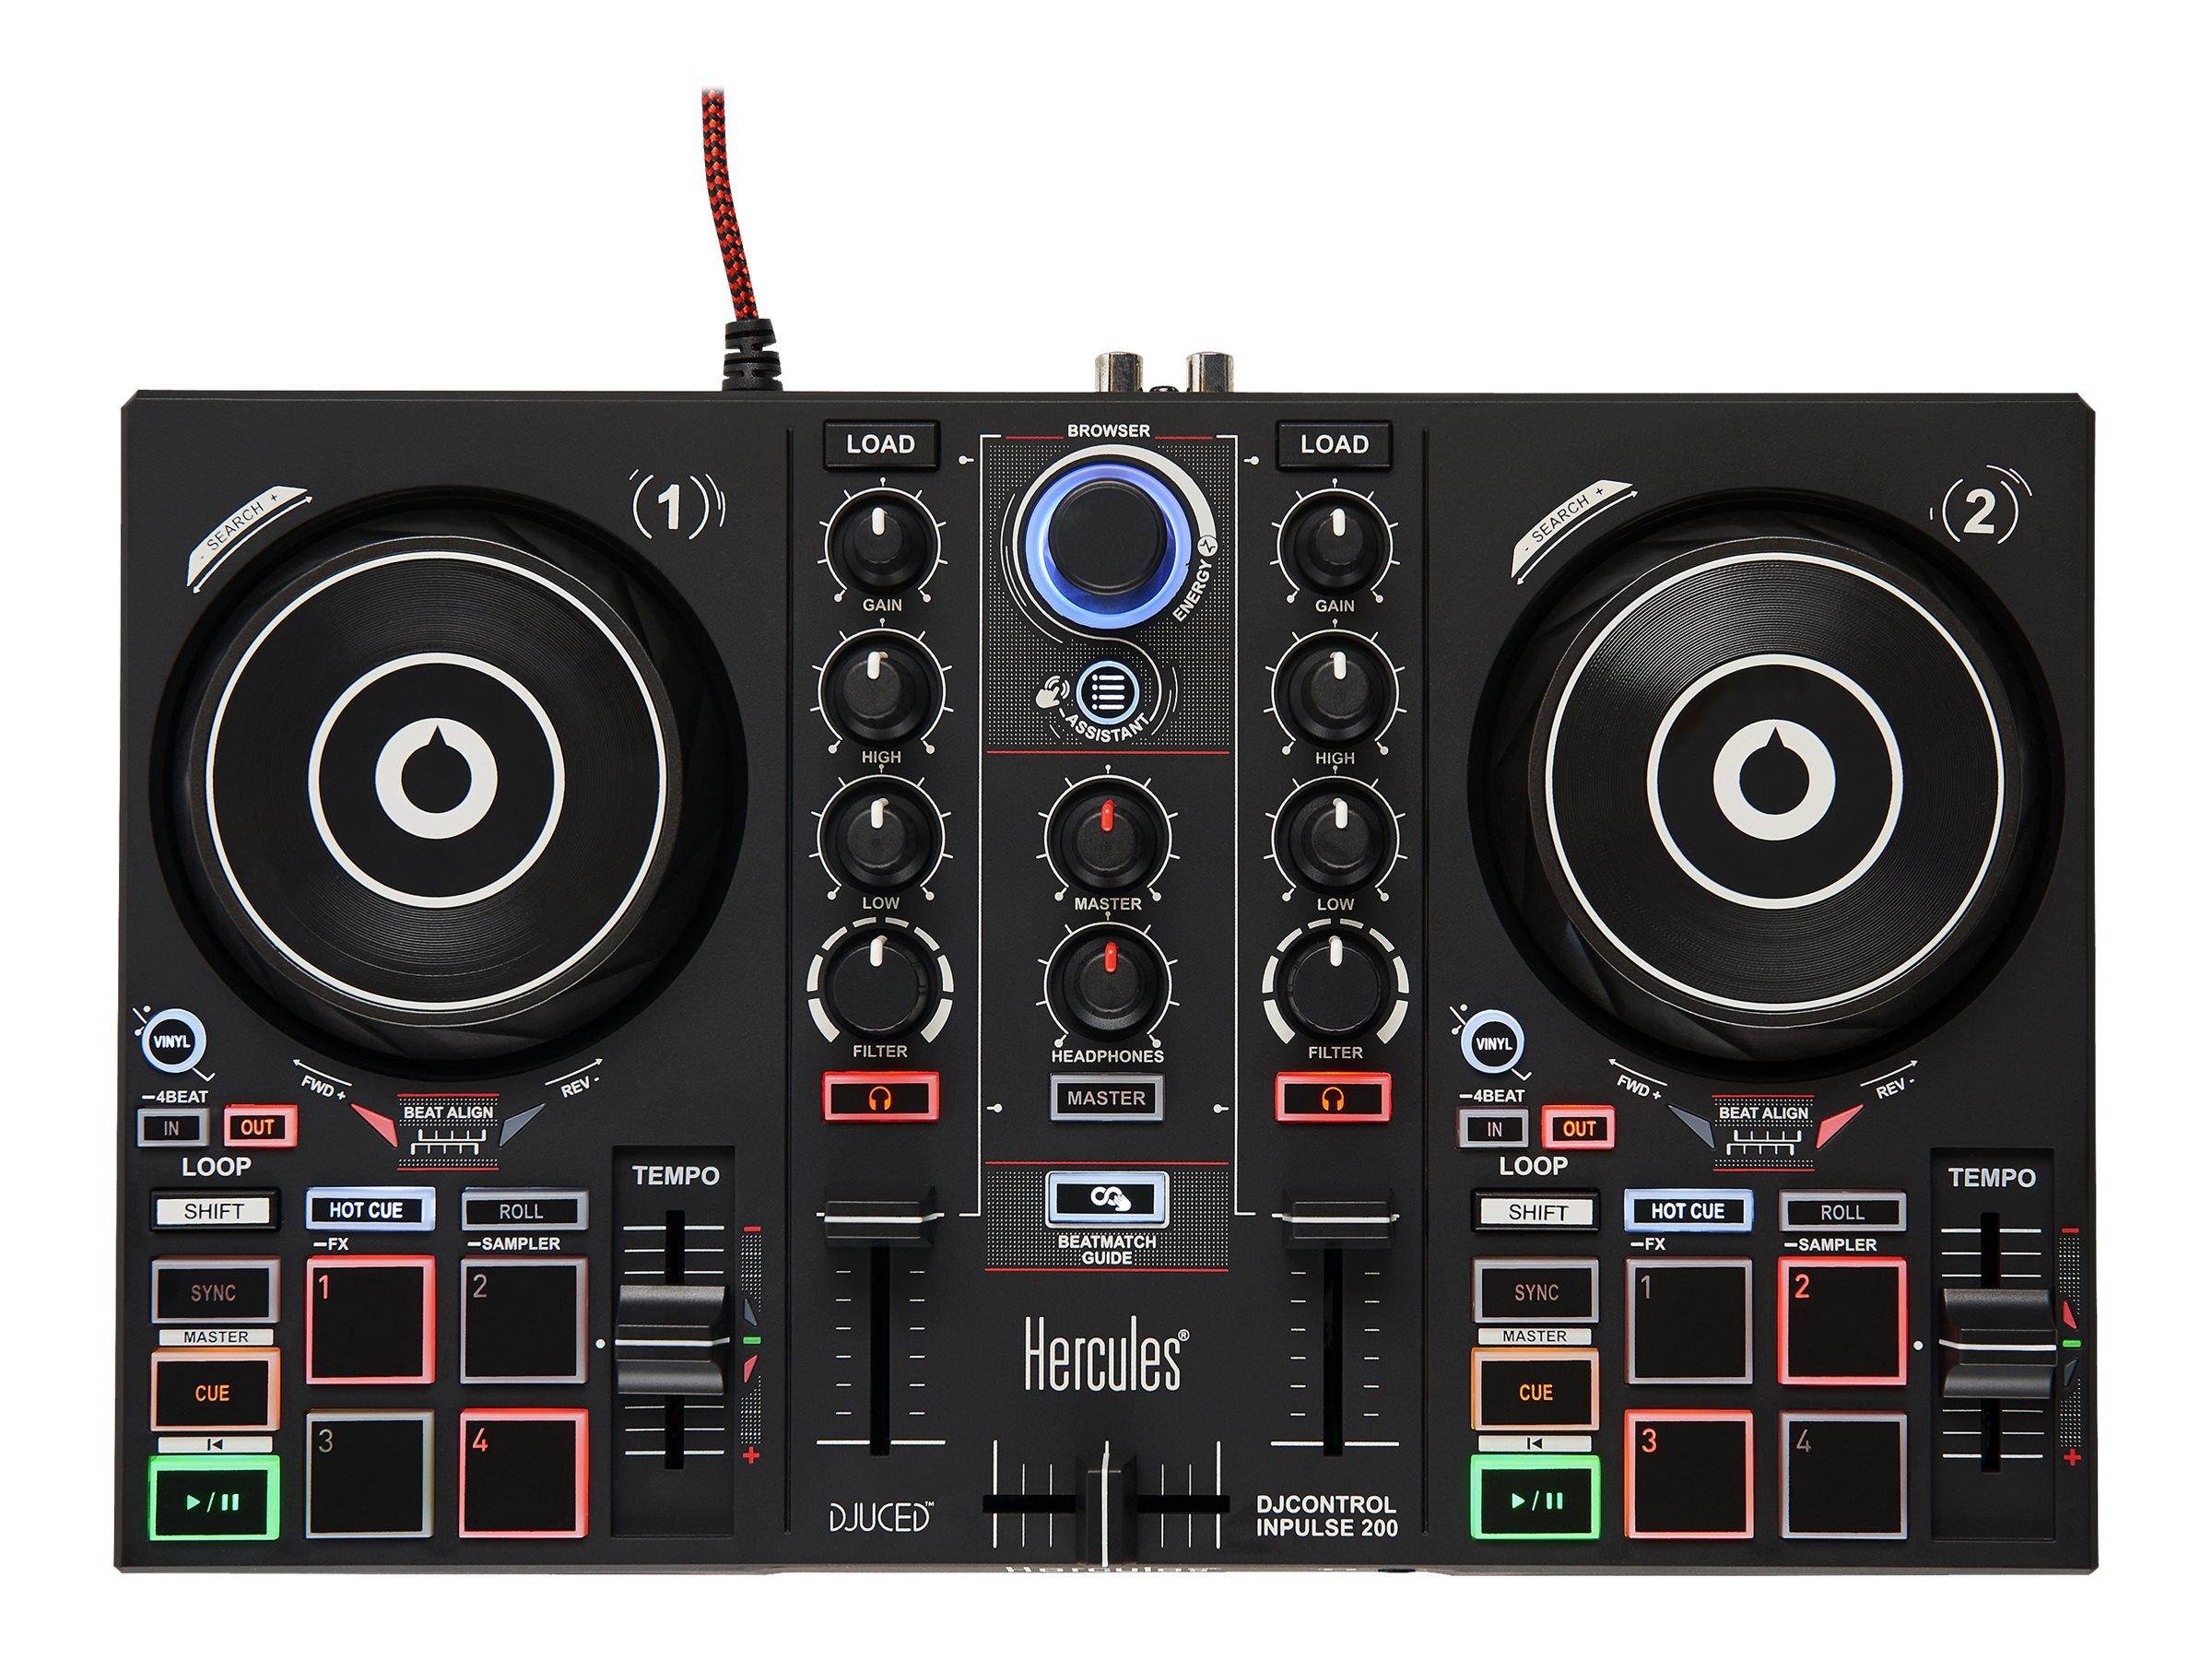 Hercules DJ Control Inpulse 200 - DJ-Regler